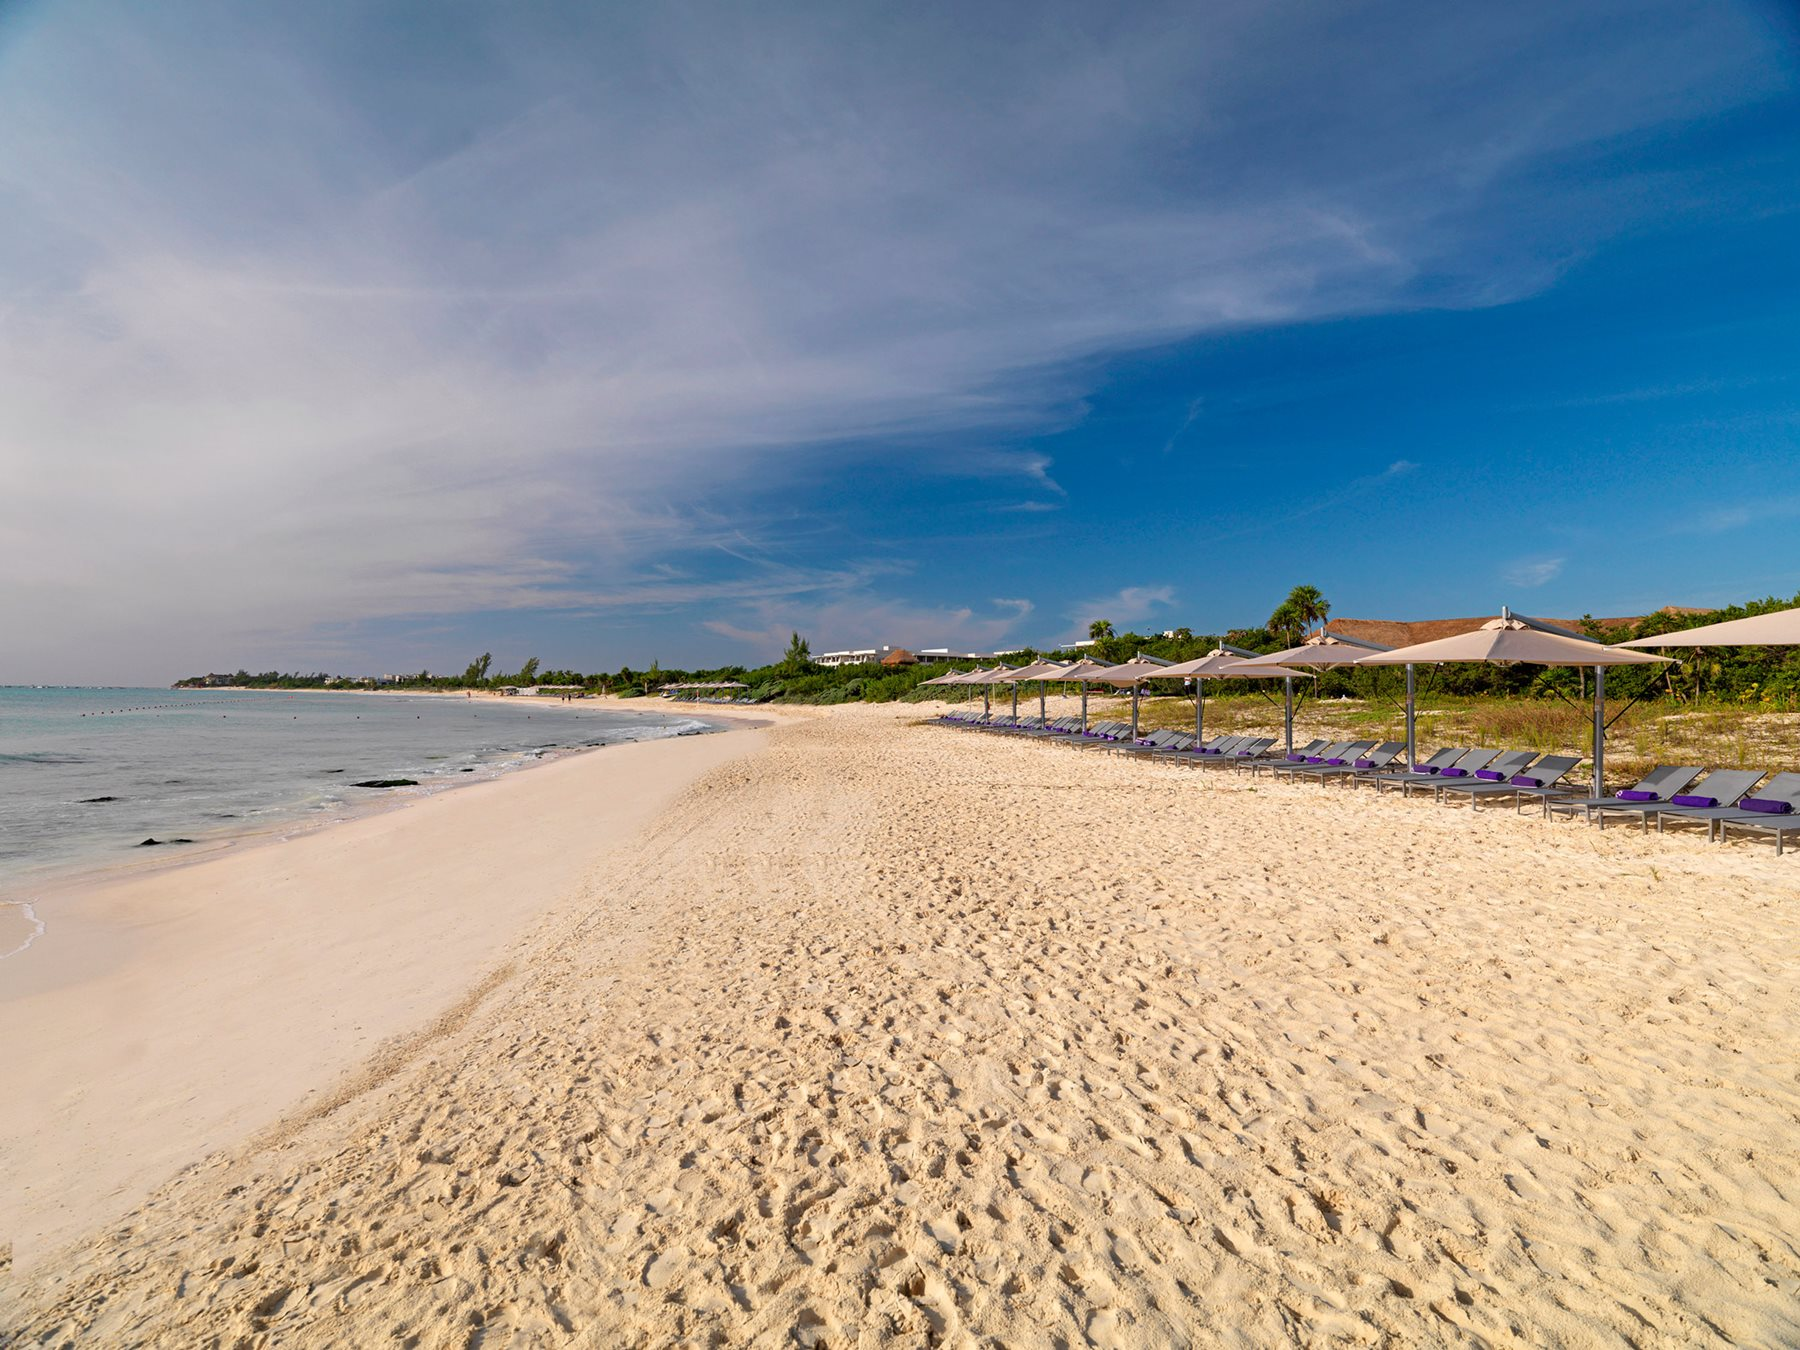 Paradisus Playa Del Carmen La Perla - Riviera Maya | Transat on balboa park map, mountain view map, puerto rico map, solana beach map, old town map,